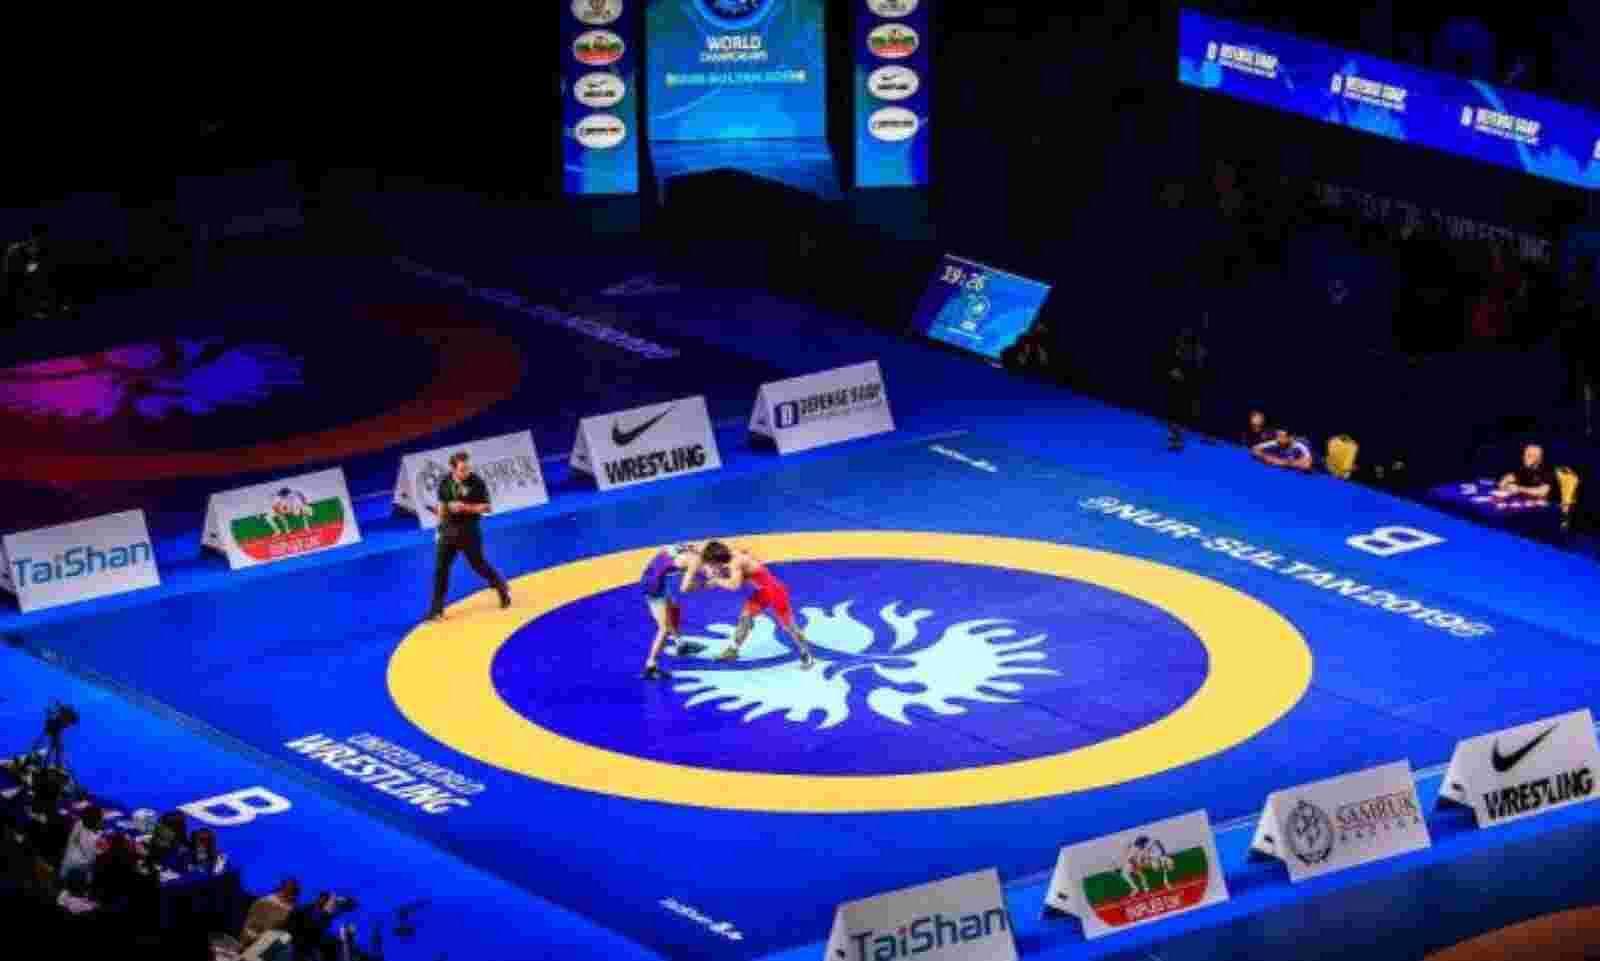 World wrestling meet